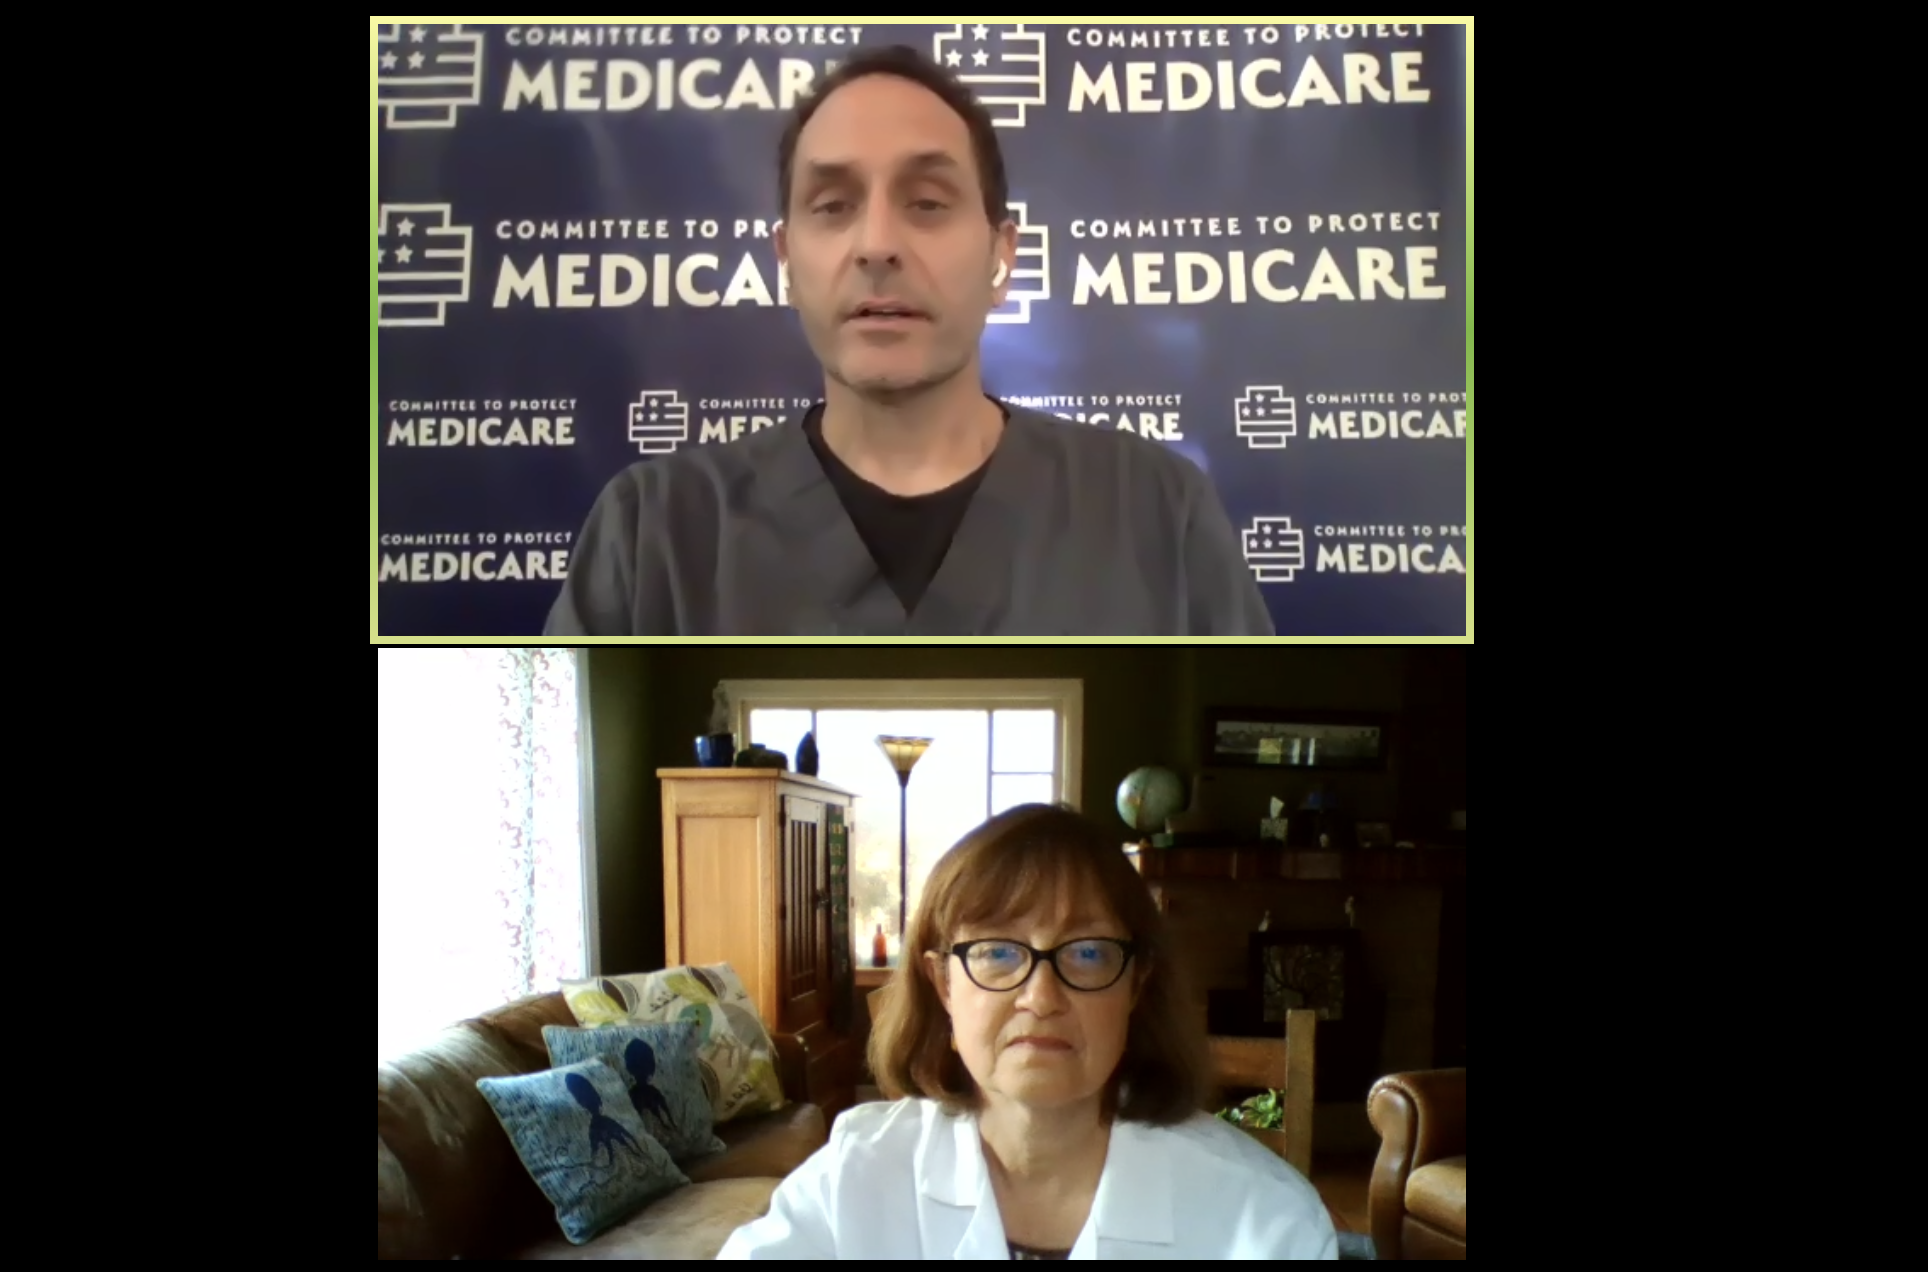 Michigan doctors call on Trump to cancel Muskegon rally